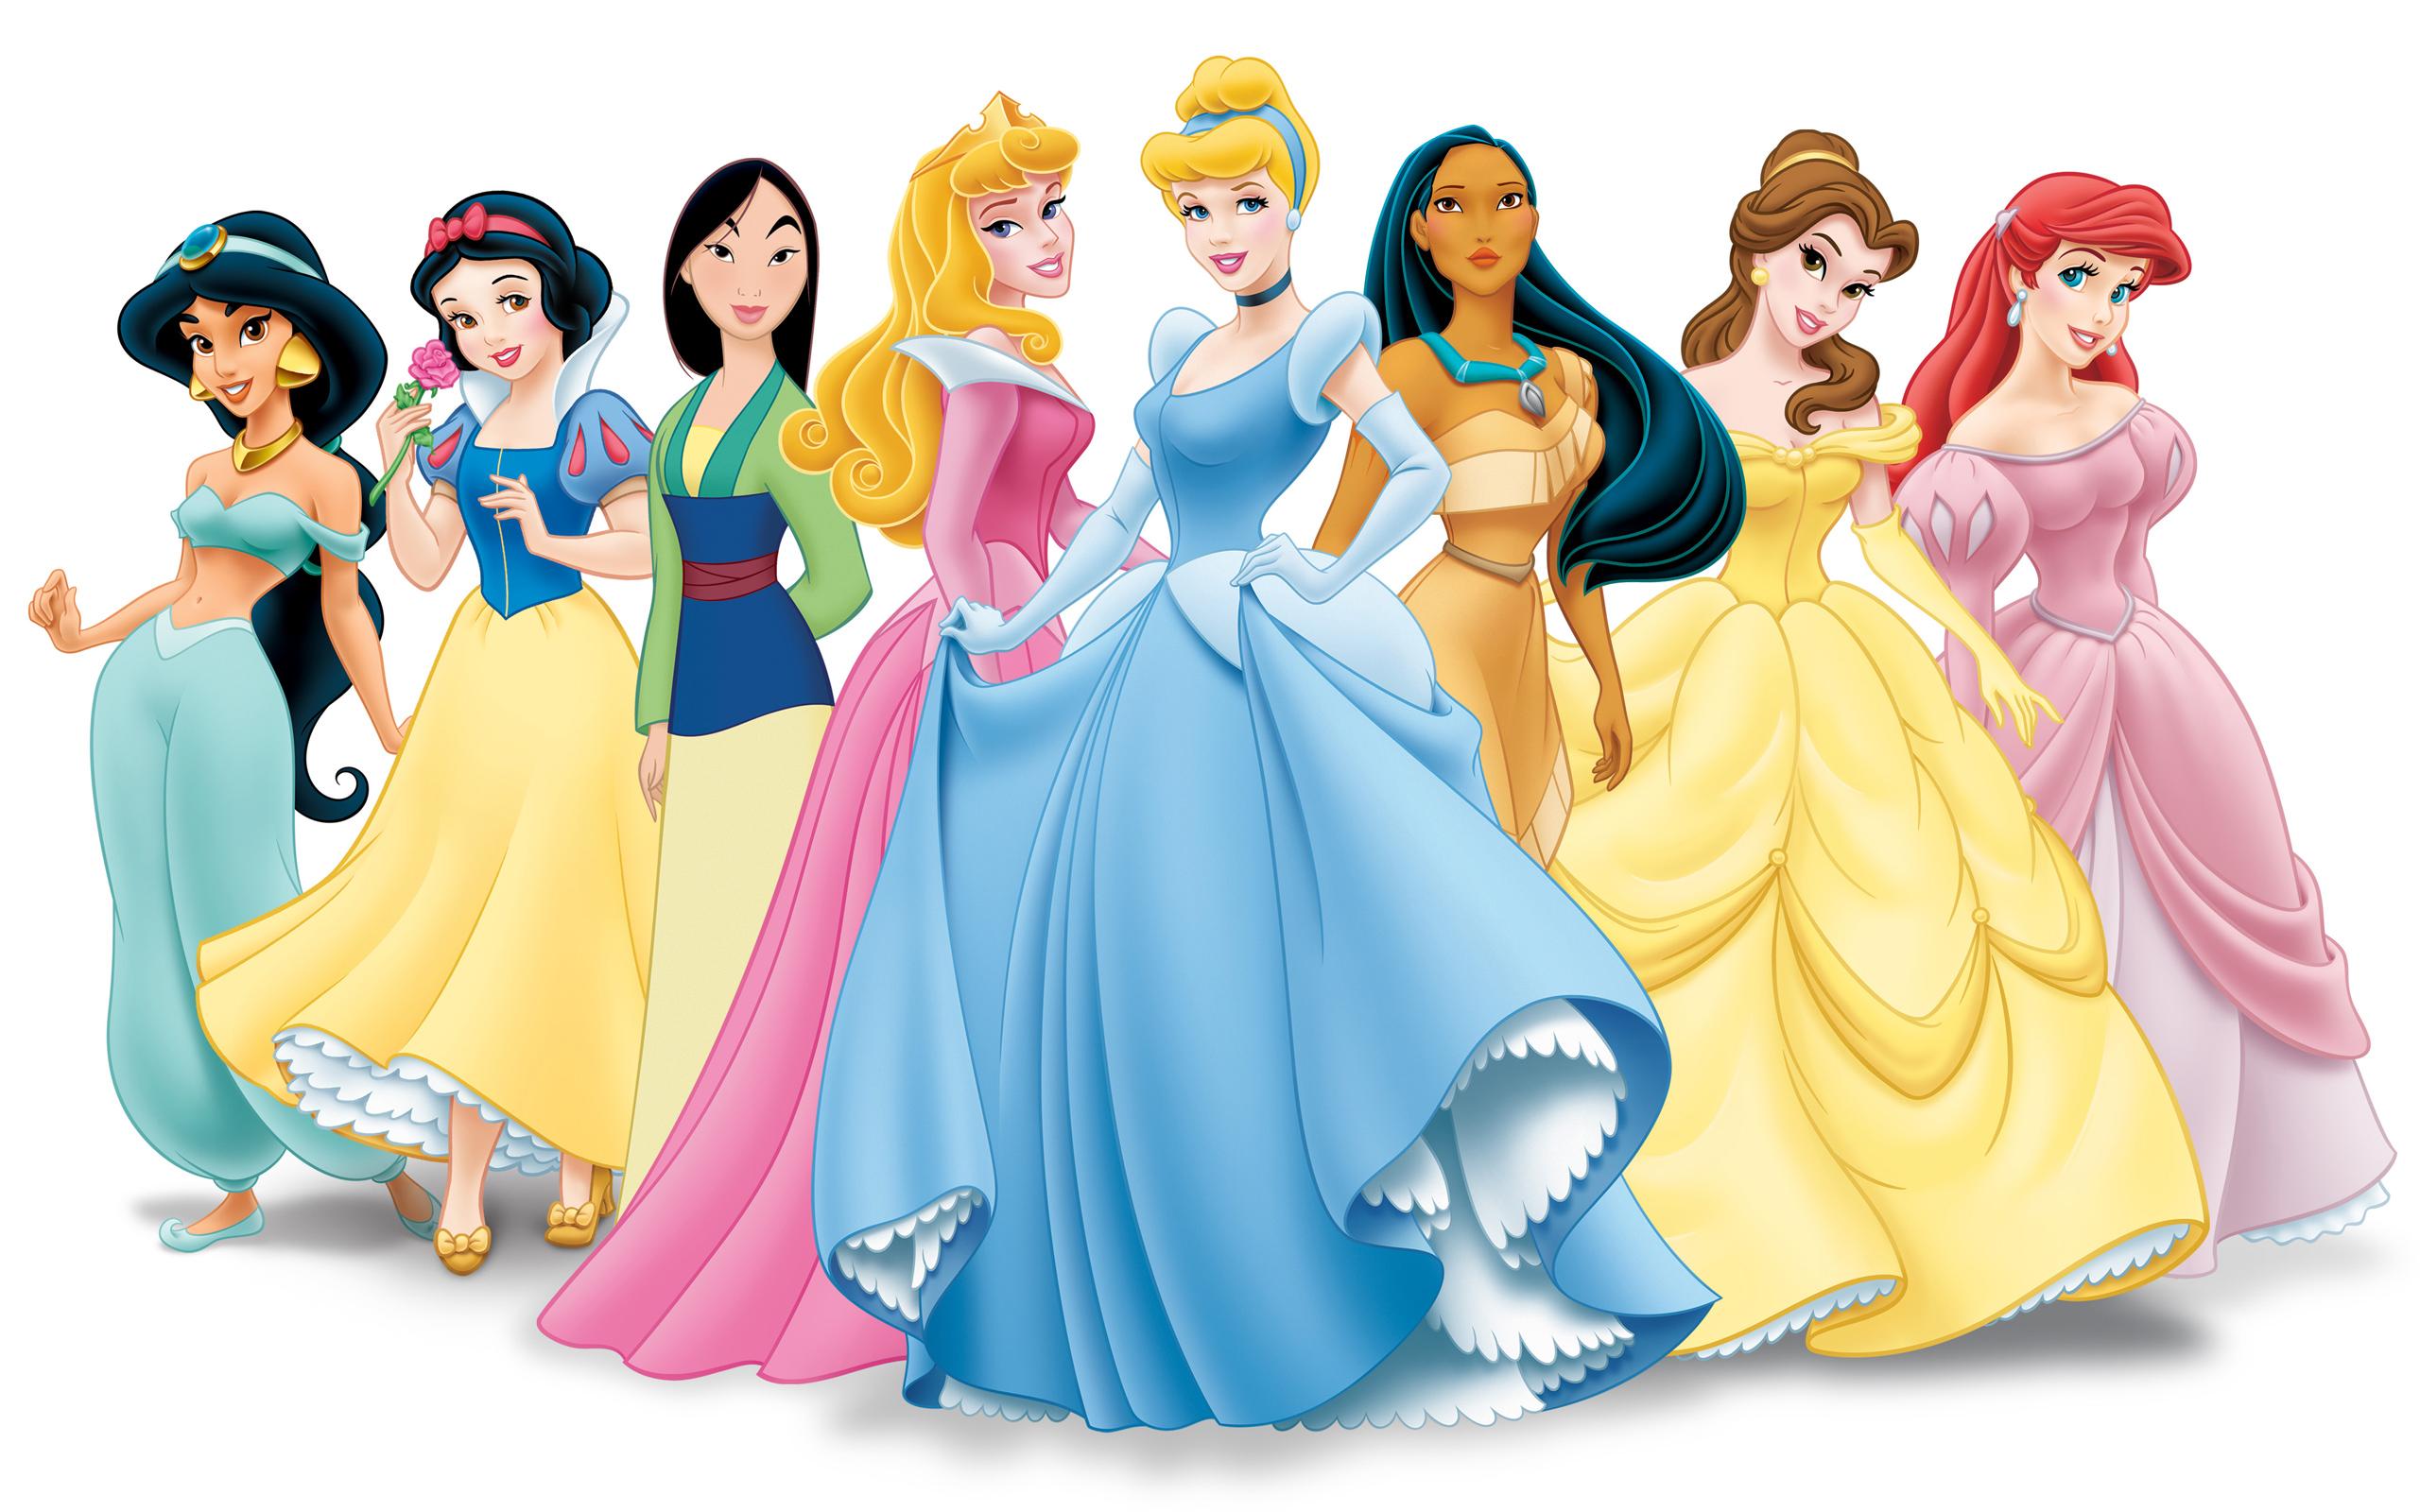 Disney Princess Wallpapers HD Wallpapers 2560x1600